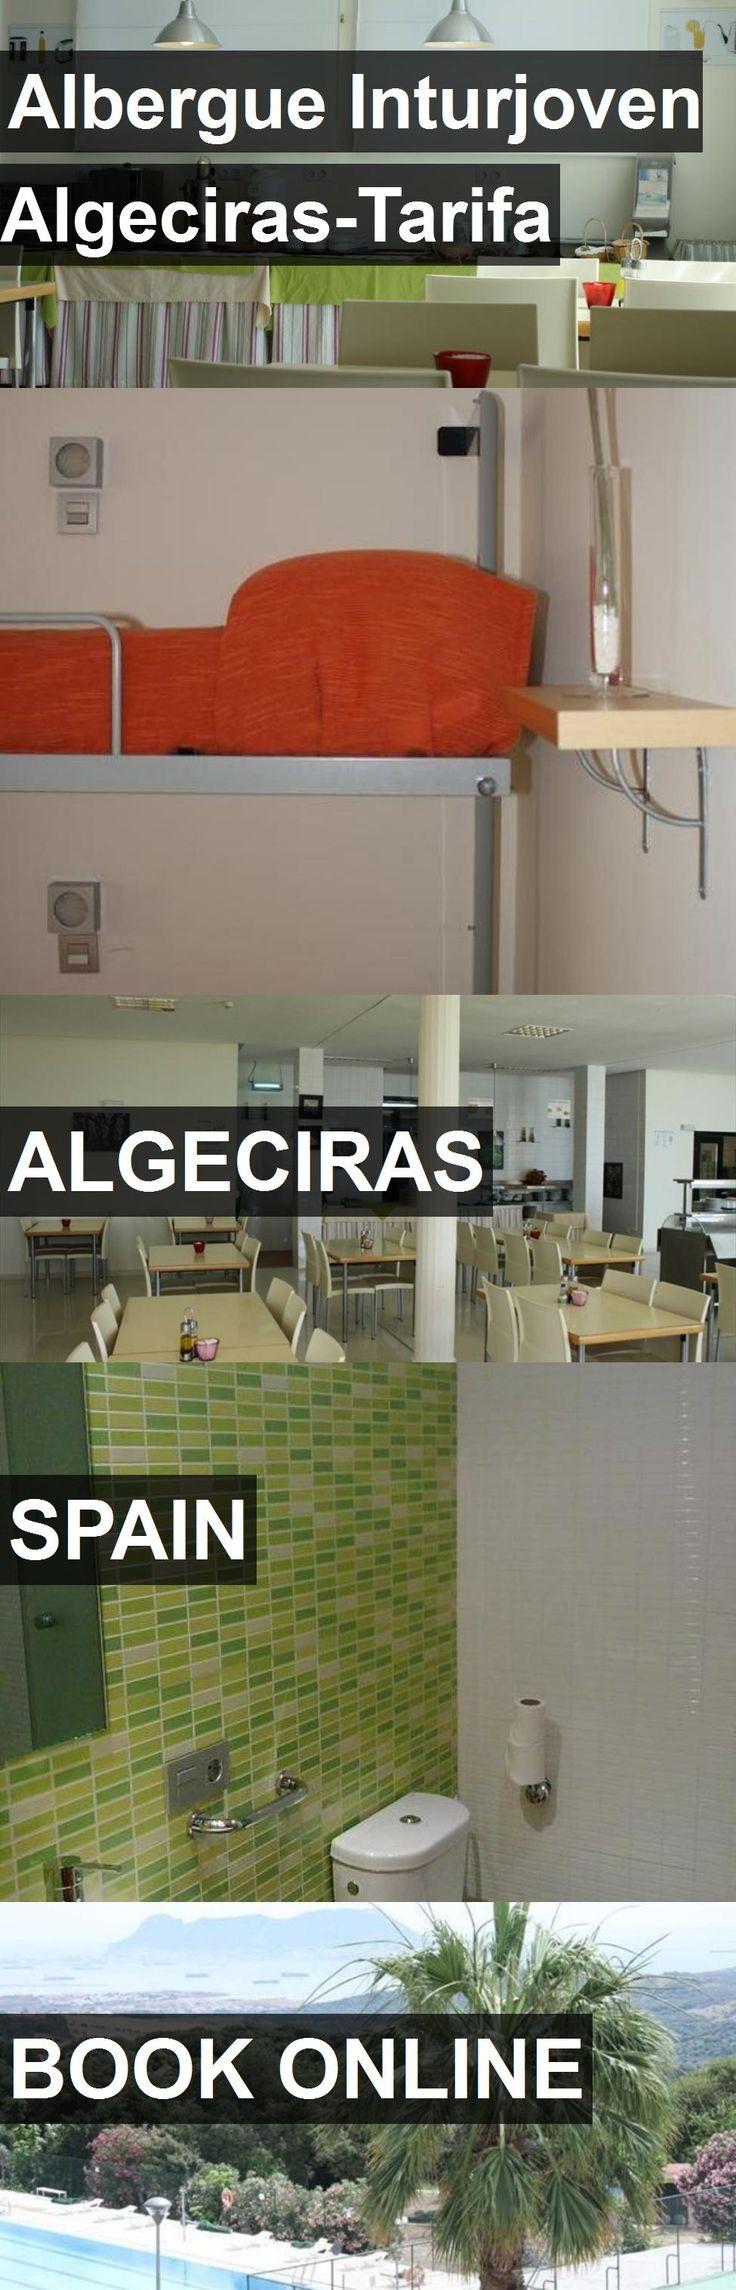 Hotel Albergue Inturjoven Algeciras-Tarifa in Algeciras, Spain. For more information, photos, reviews and best prices please follow the link. #Spain #Algeciras #travel #vacation #hotel